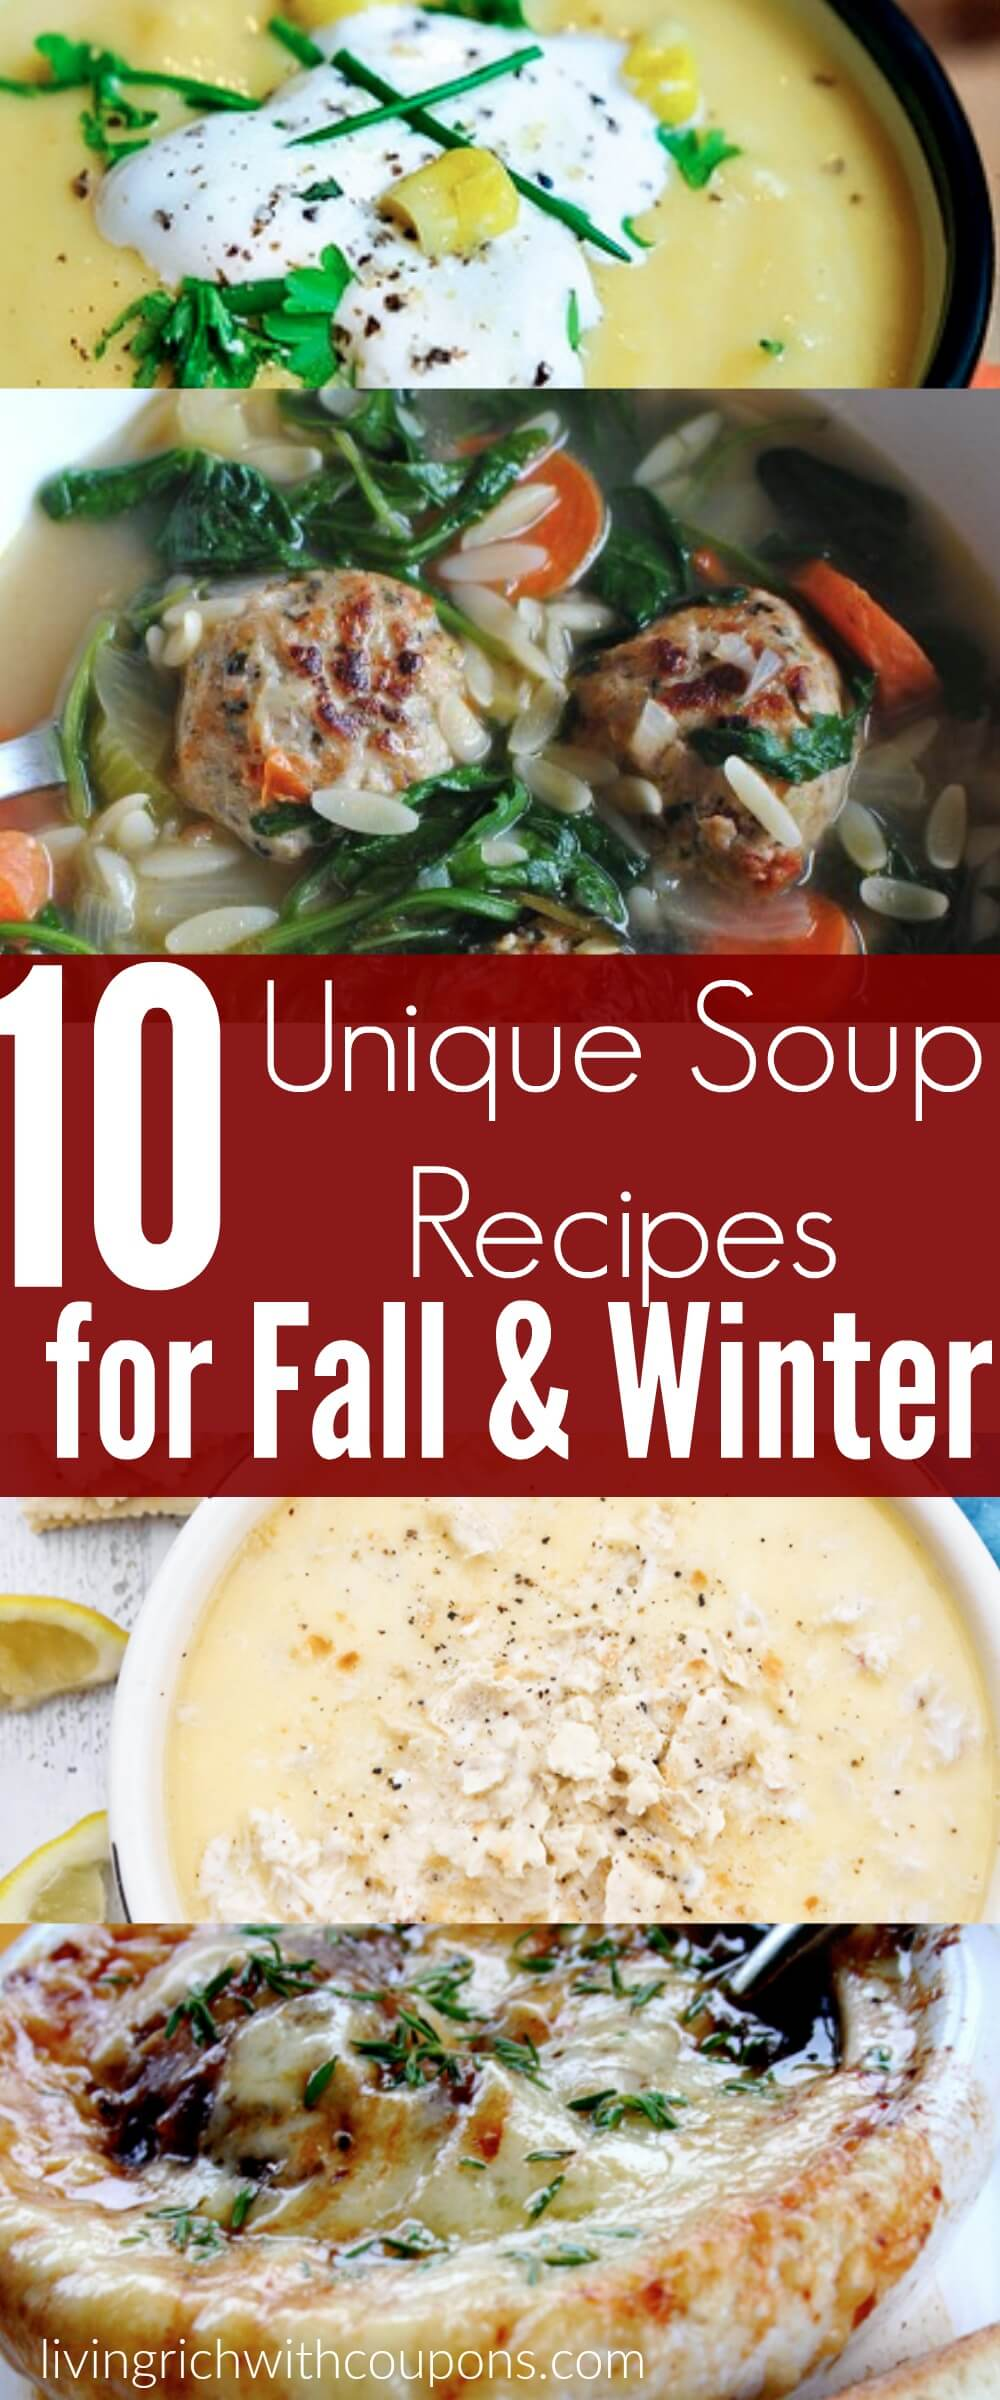 10 Unique Soup Recipes for Fall & Winter